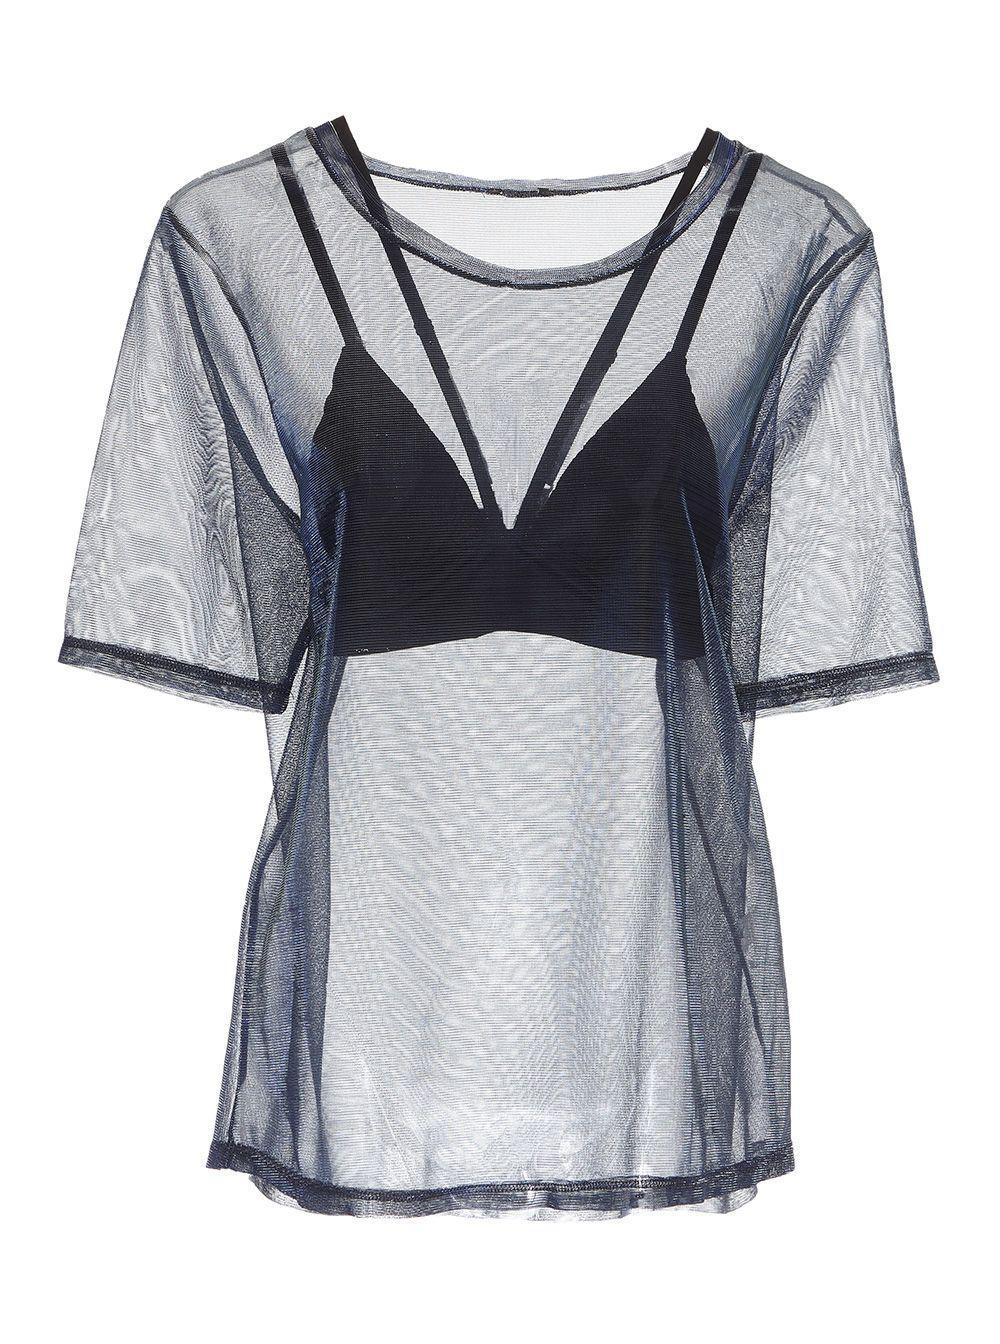 0df138c90c Cosabella - Blue Bisou Strappy Triangle Bralette   Tee Set - Lyst. View  fullscreen